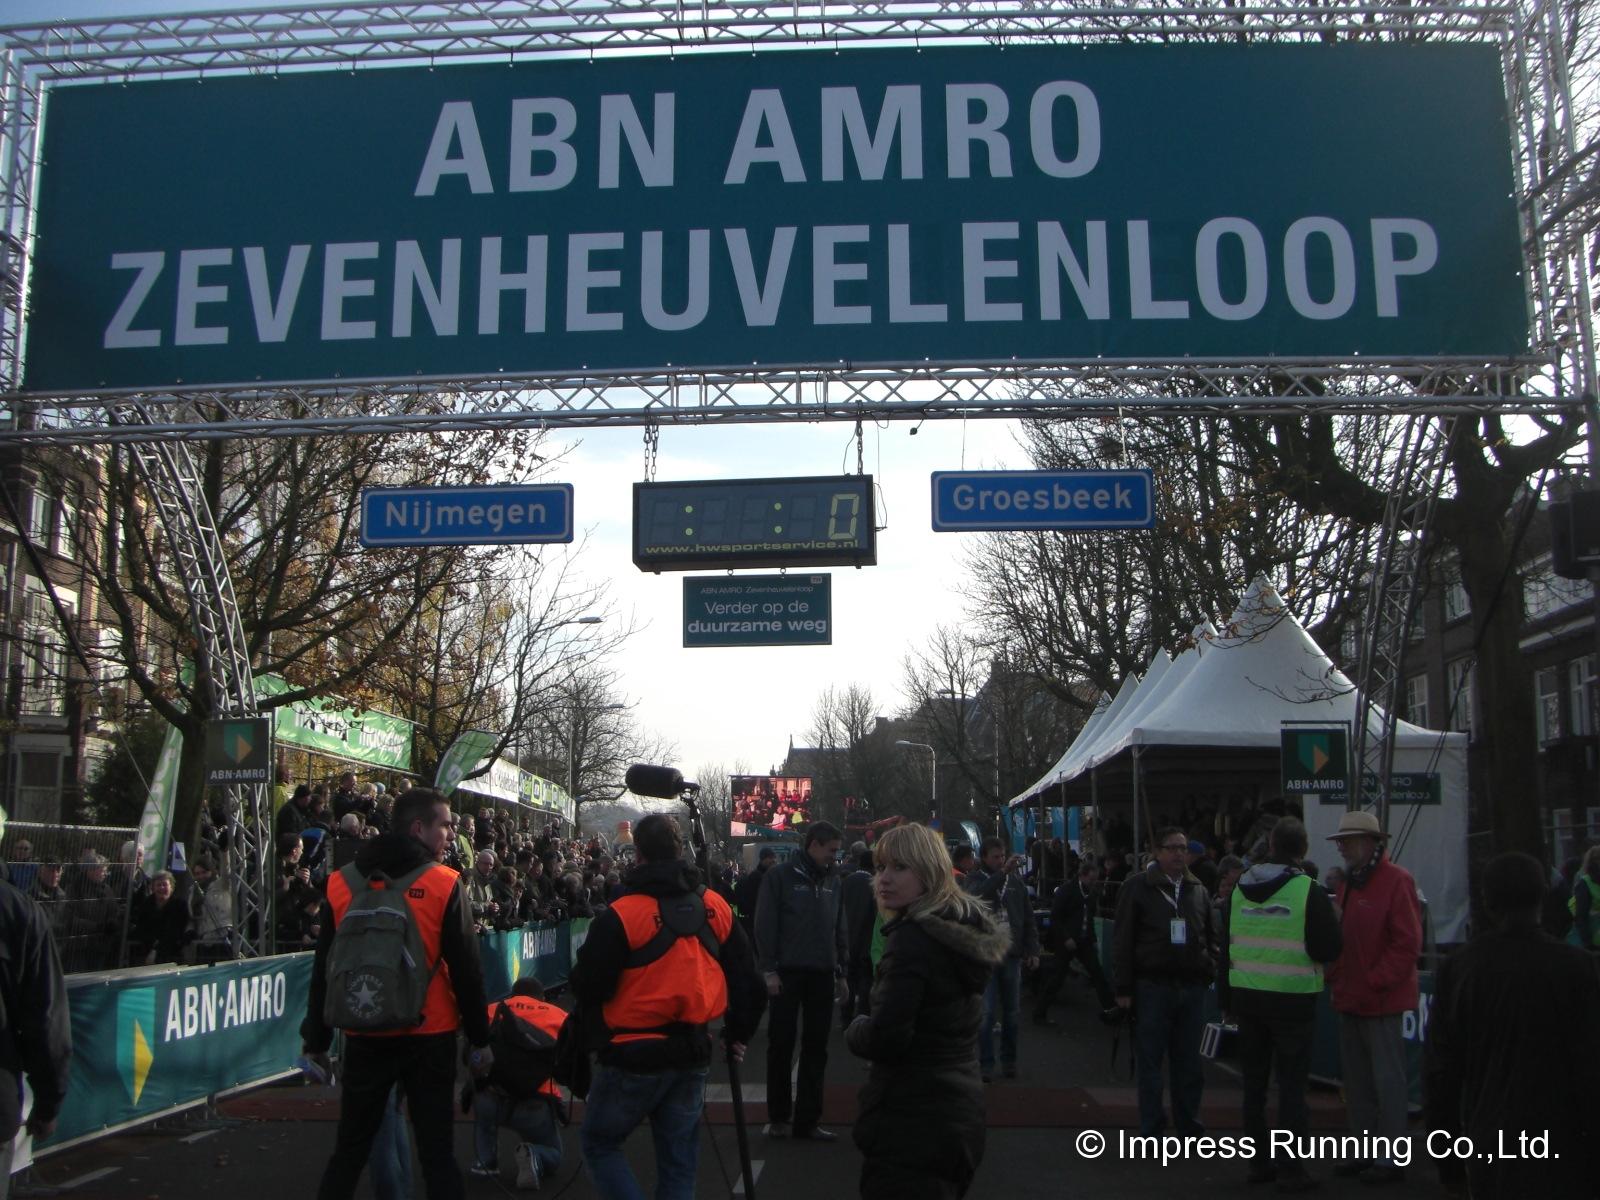 Nijmegen_CIMG3284